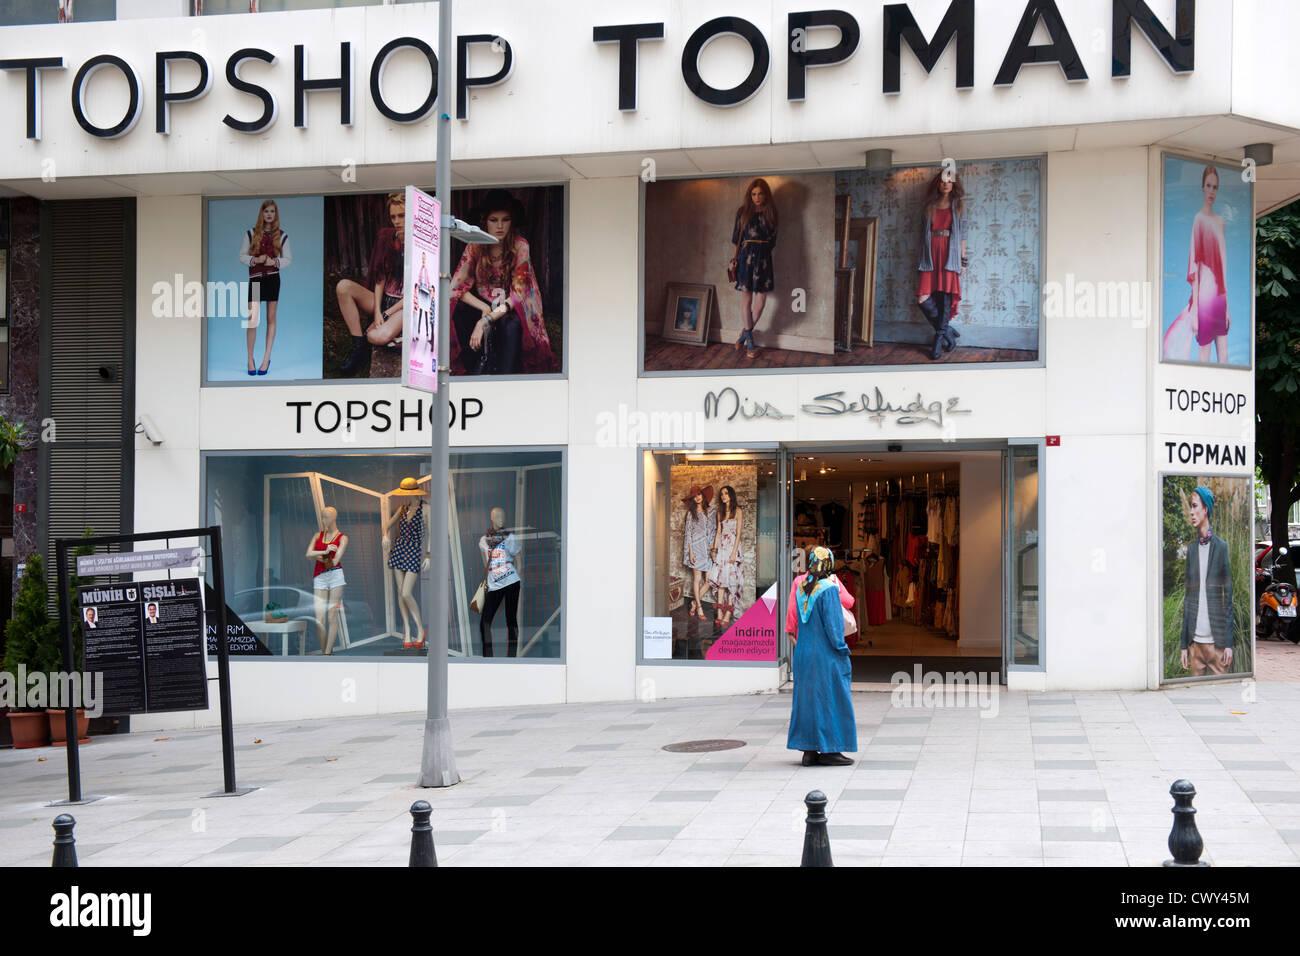 Türkei, Istanbul, Nisantasi, Vali Konagi Caddesi, Topshop Topman, britisches Modelabel - Stock Image